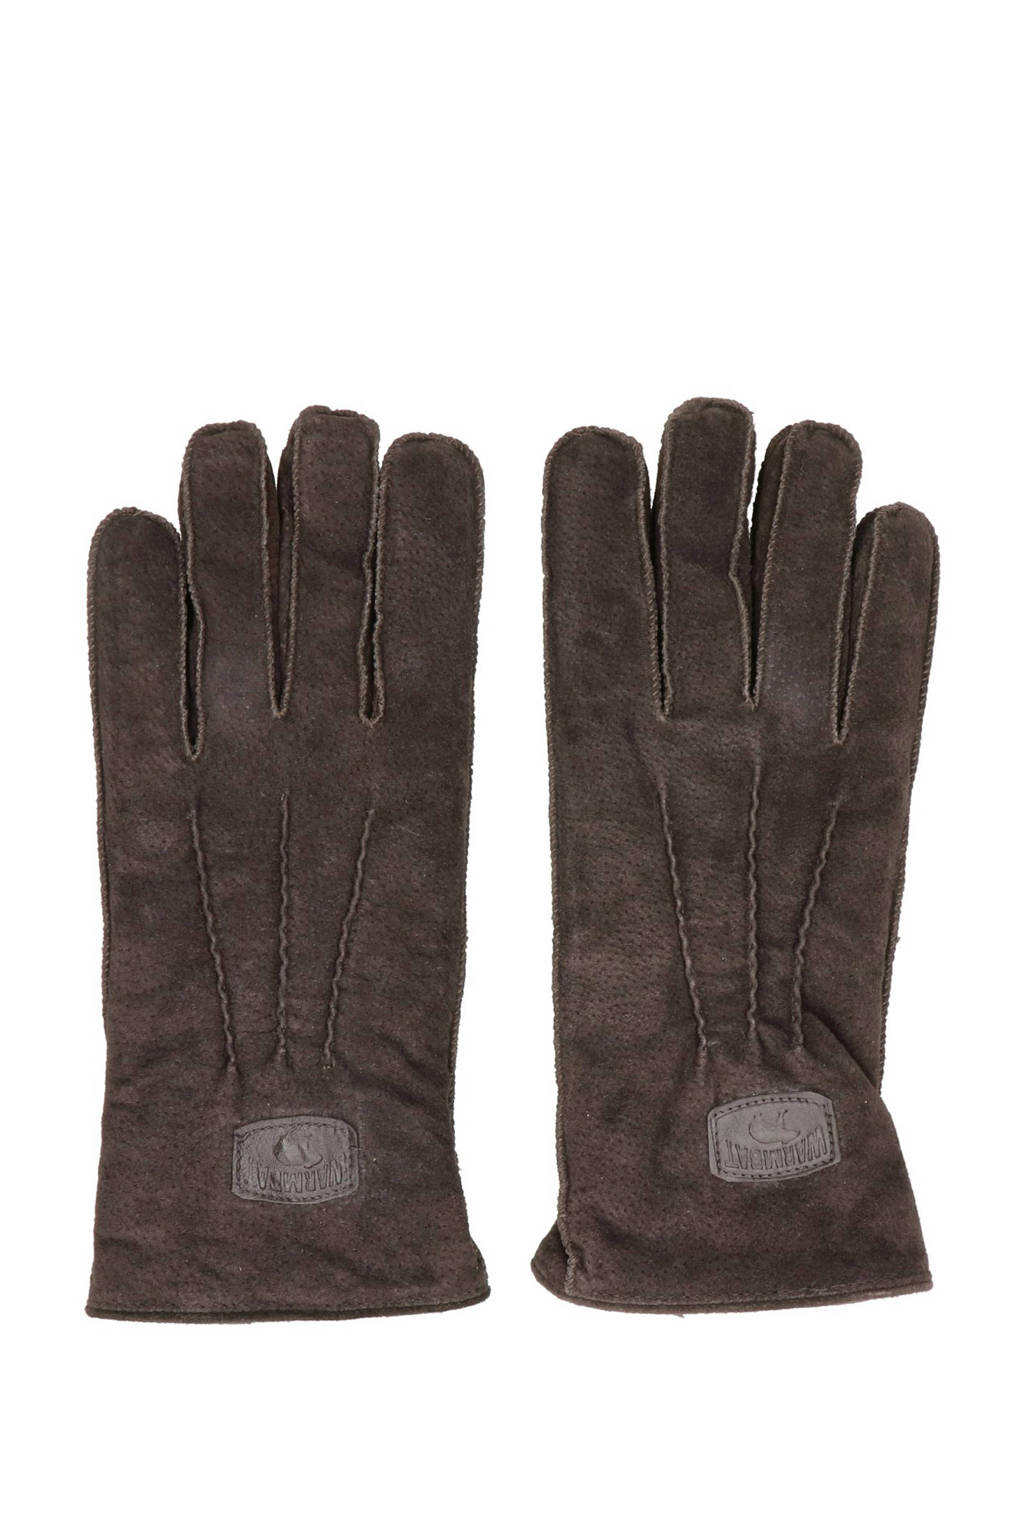 Warmbat Australia suede handschoenen donkerbruin, Expresso